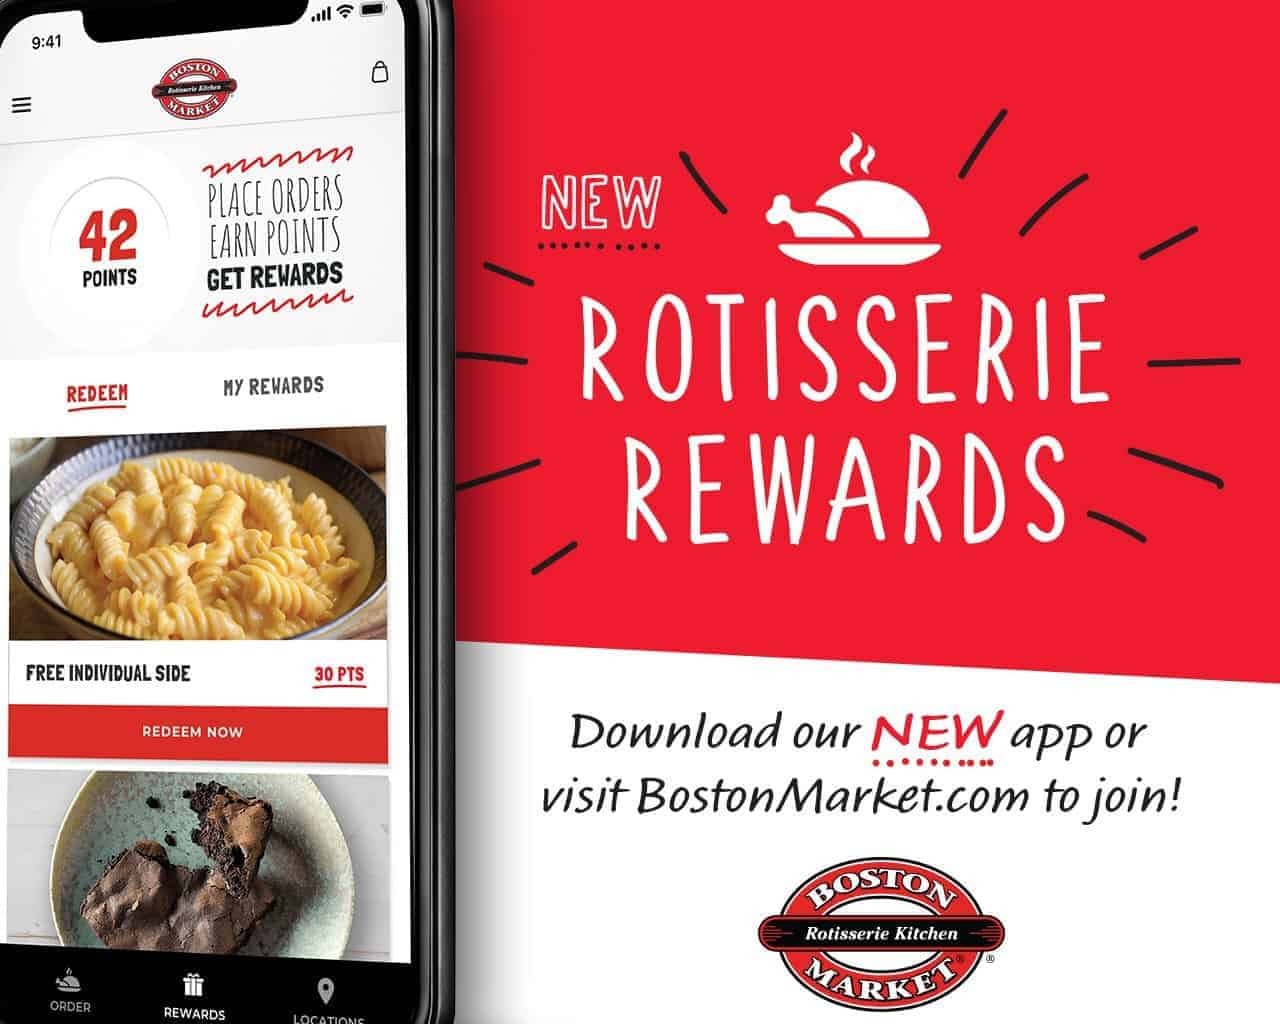 Boston Market cooks up loyalty program, Rotisserie Rewards